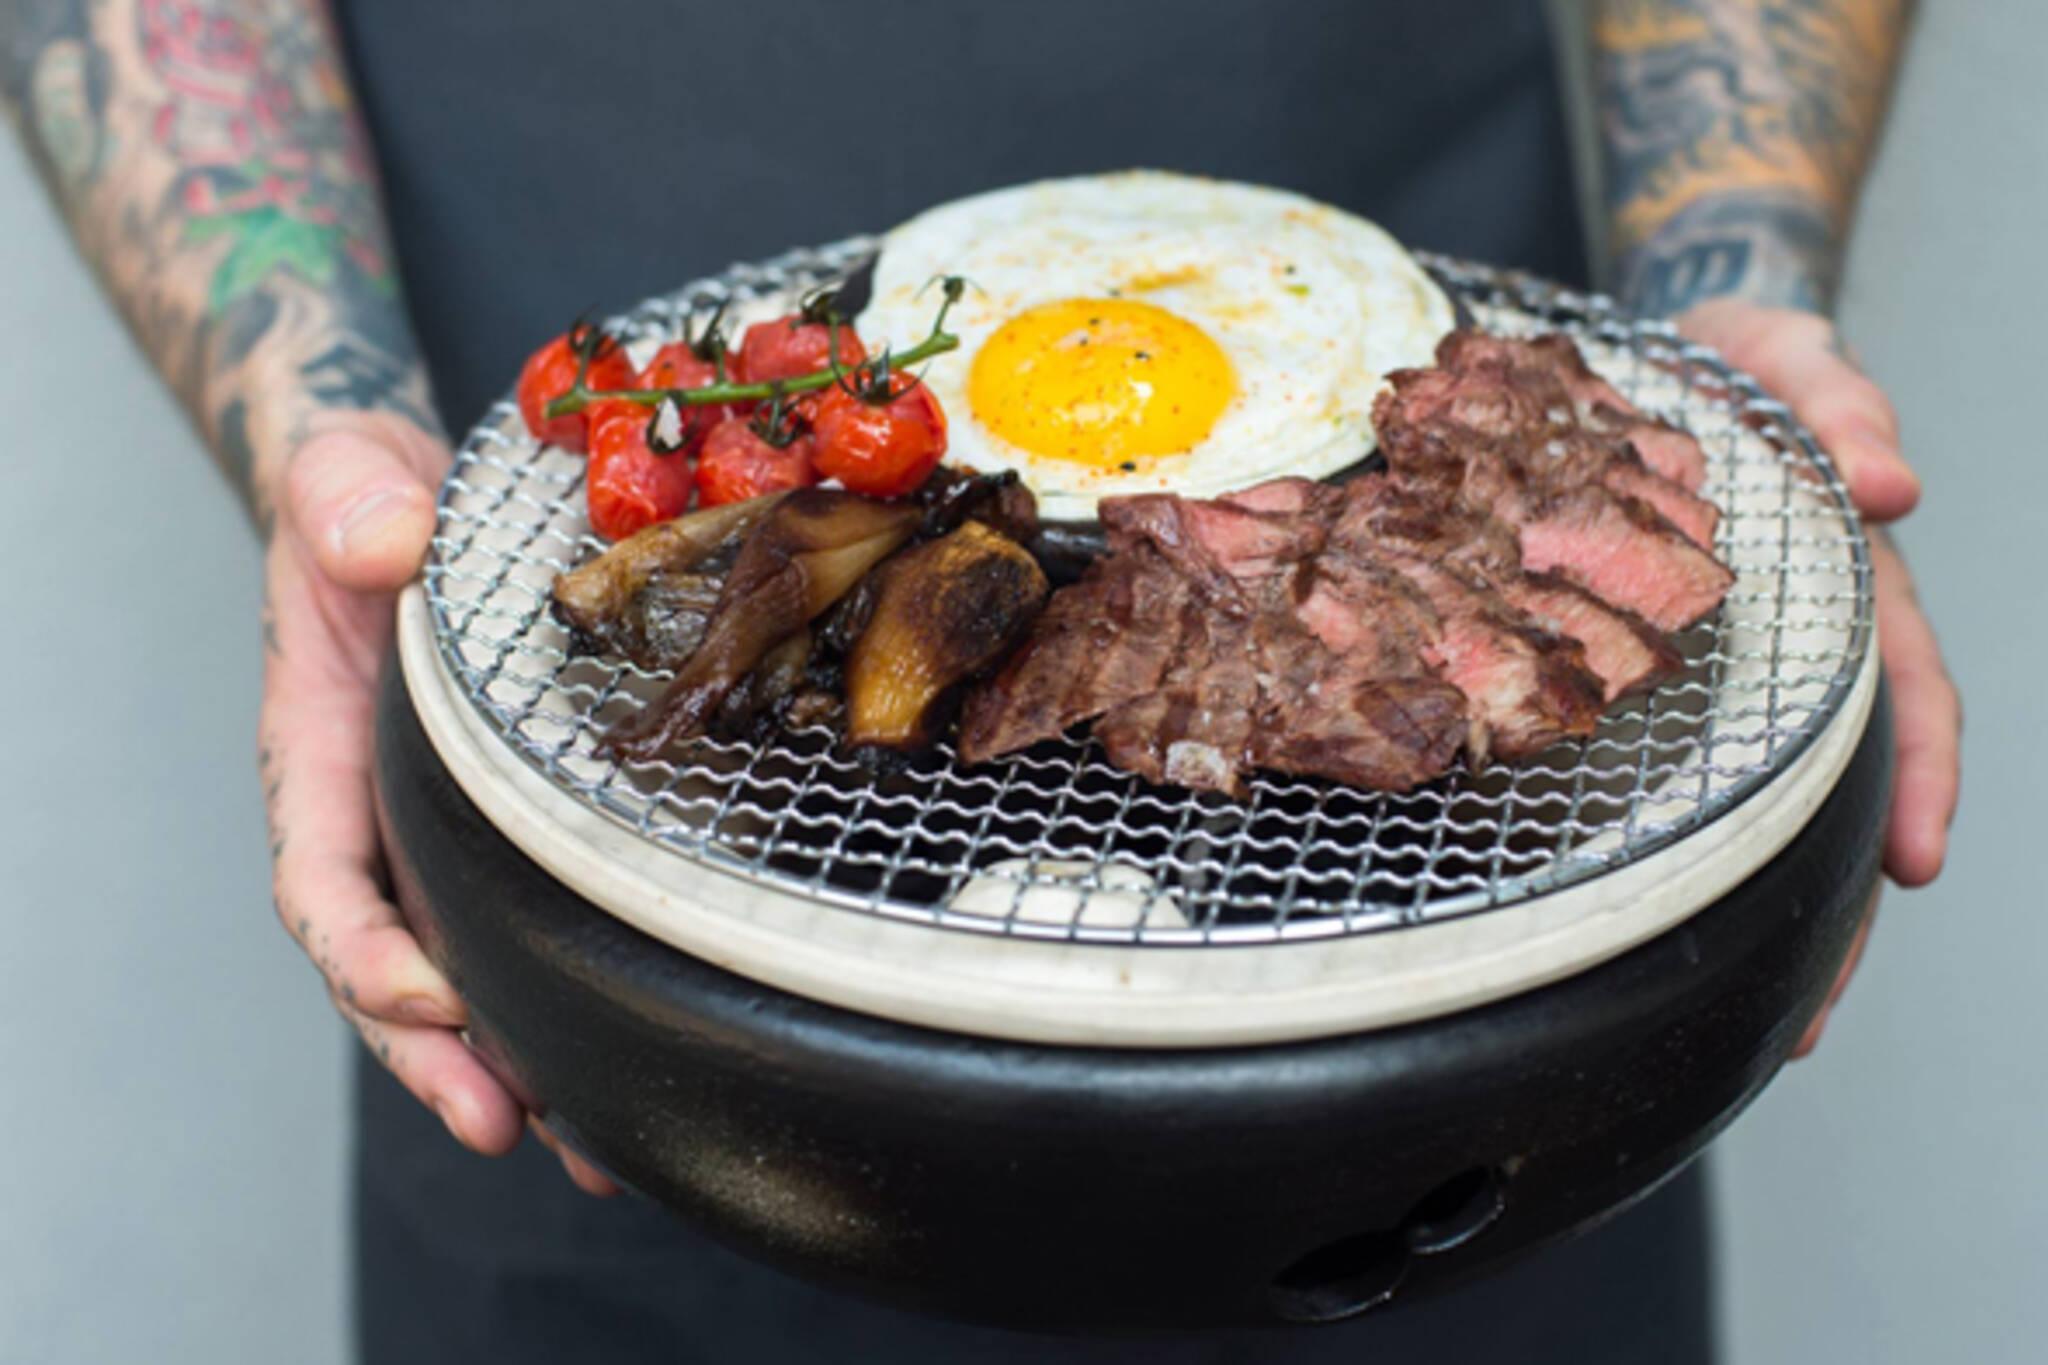 Steak and Eggs Toronto